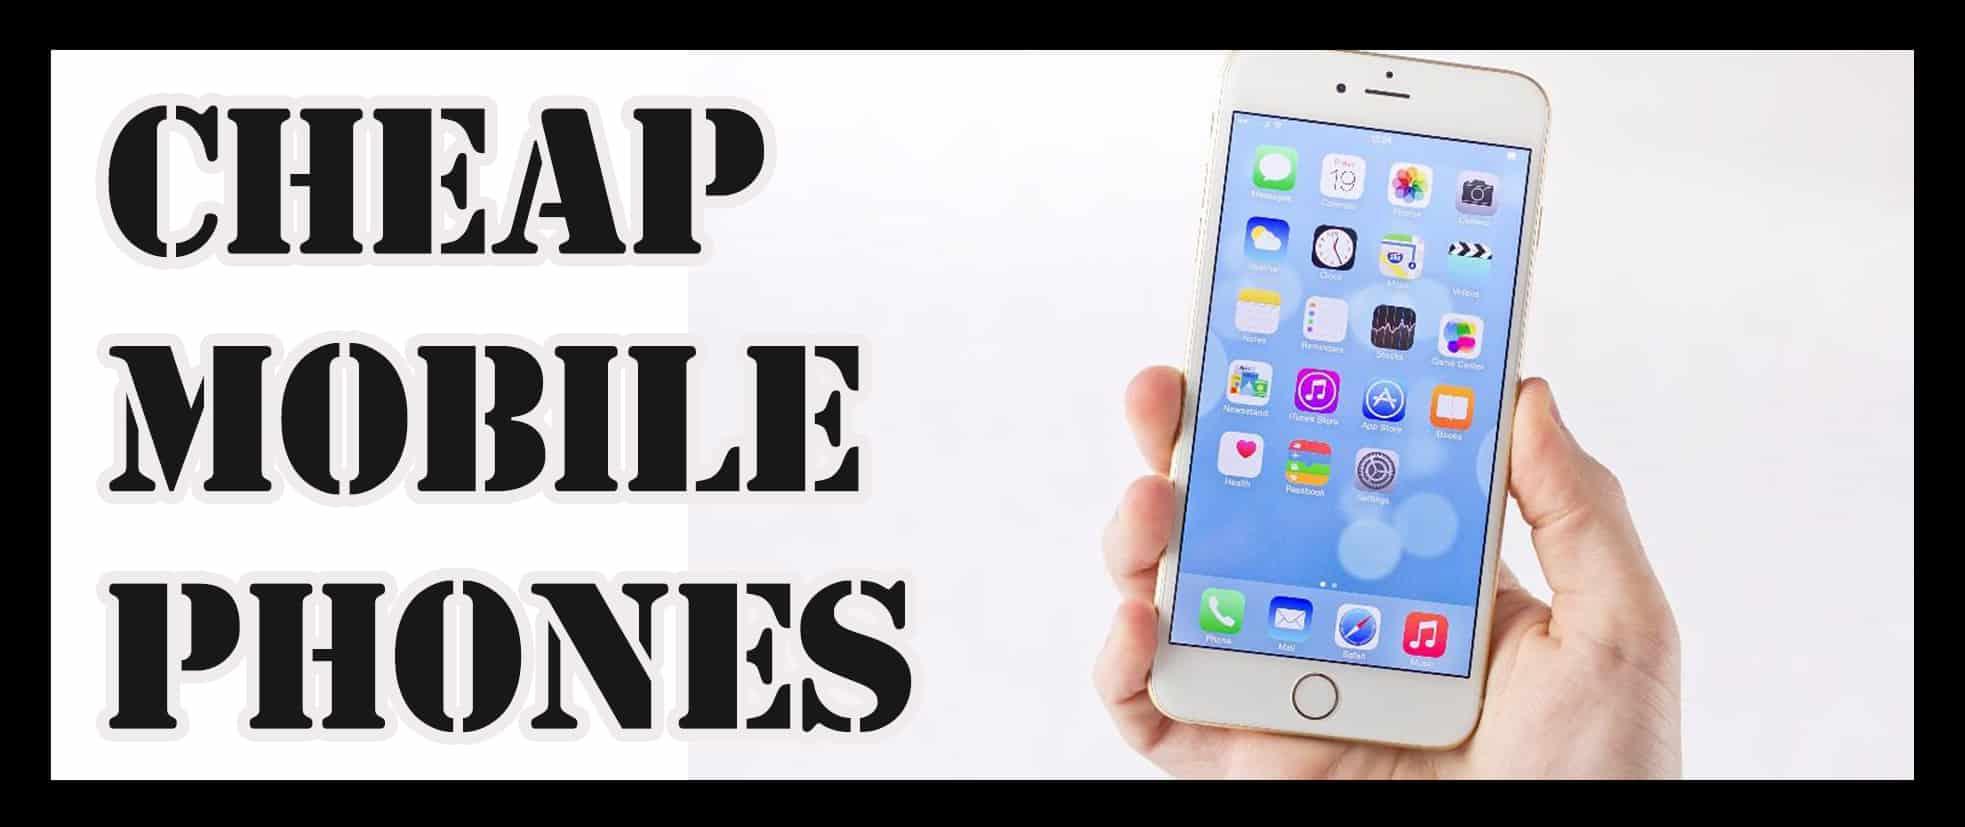 BUY NEW PHONE SALES